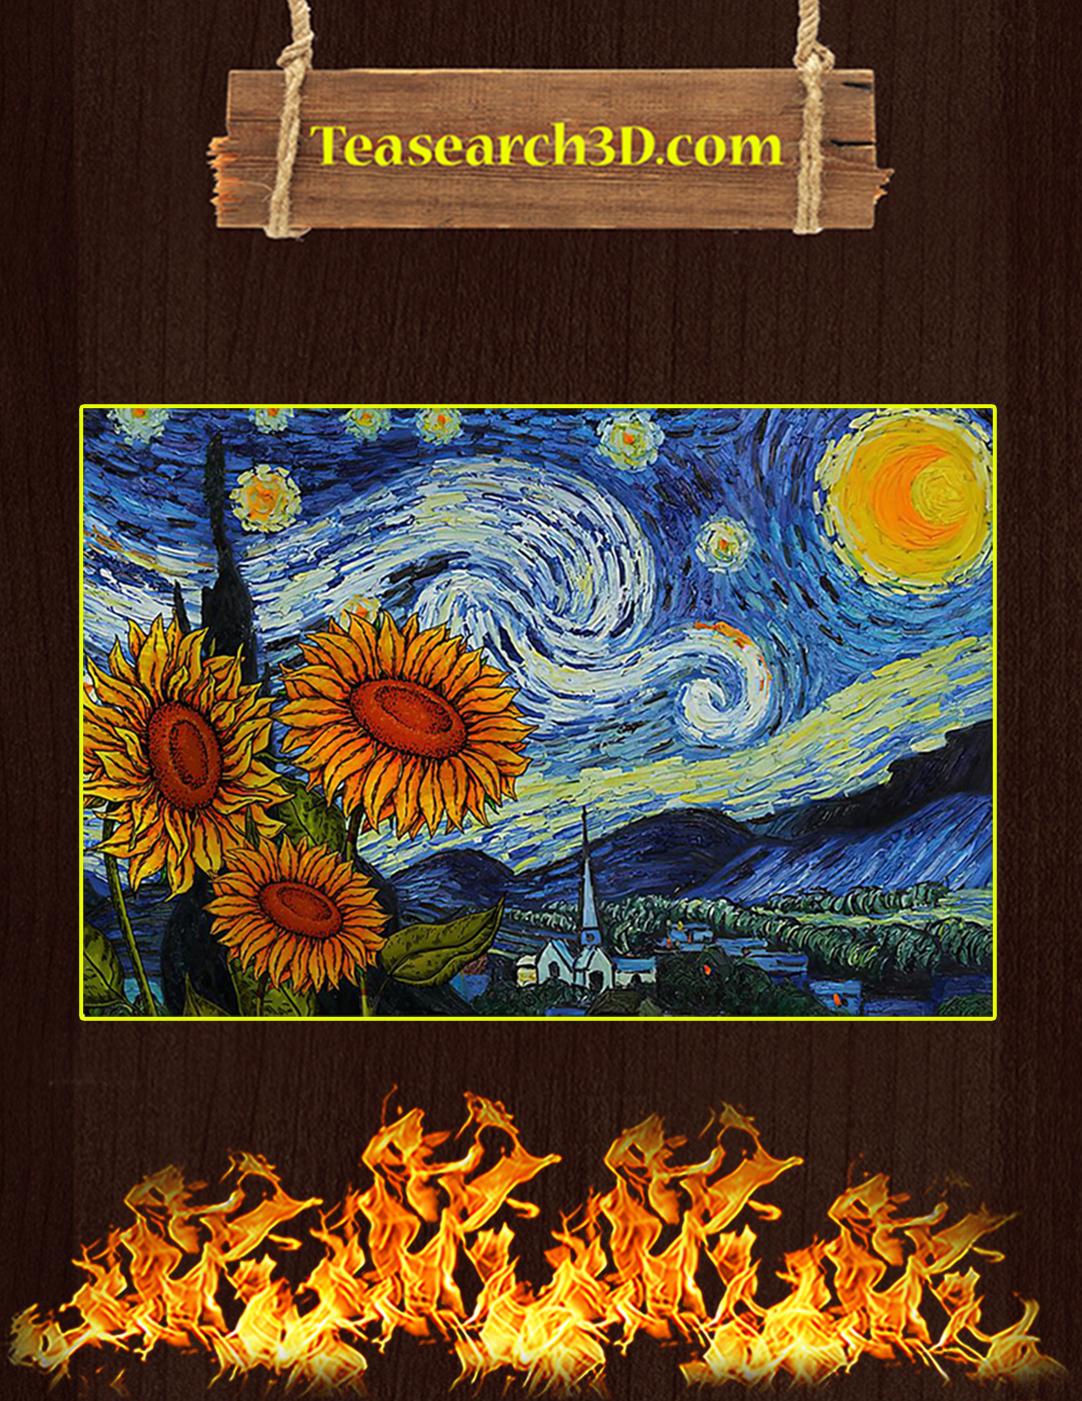 Sunflowers starry night van gogh canvas prints medium